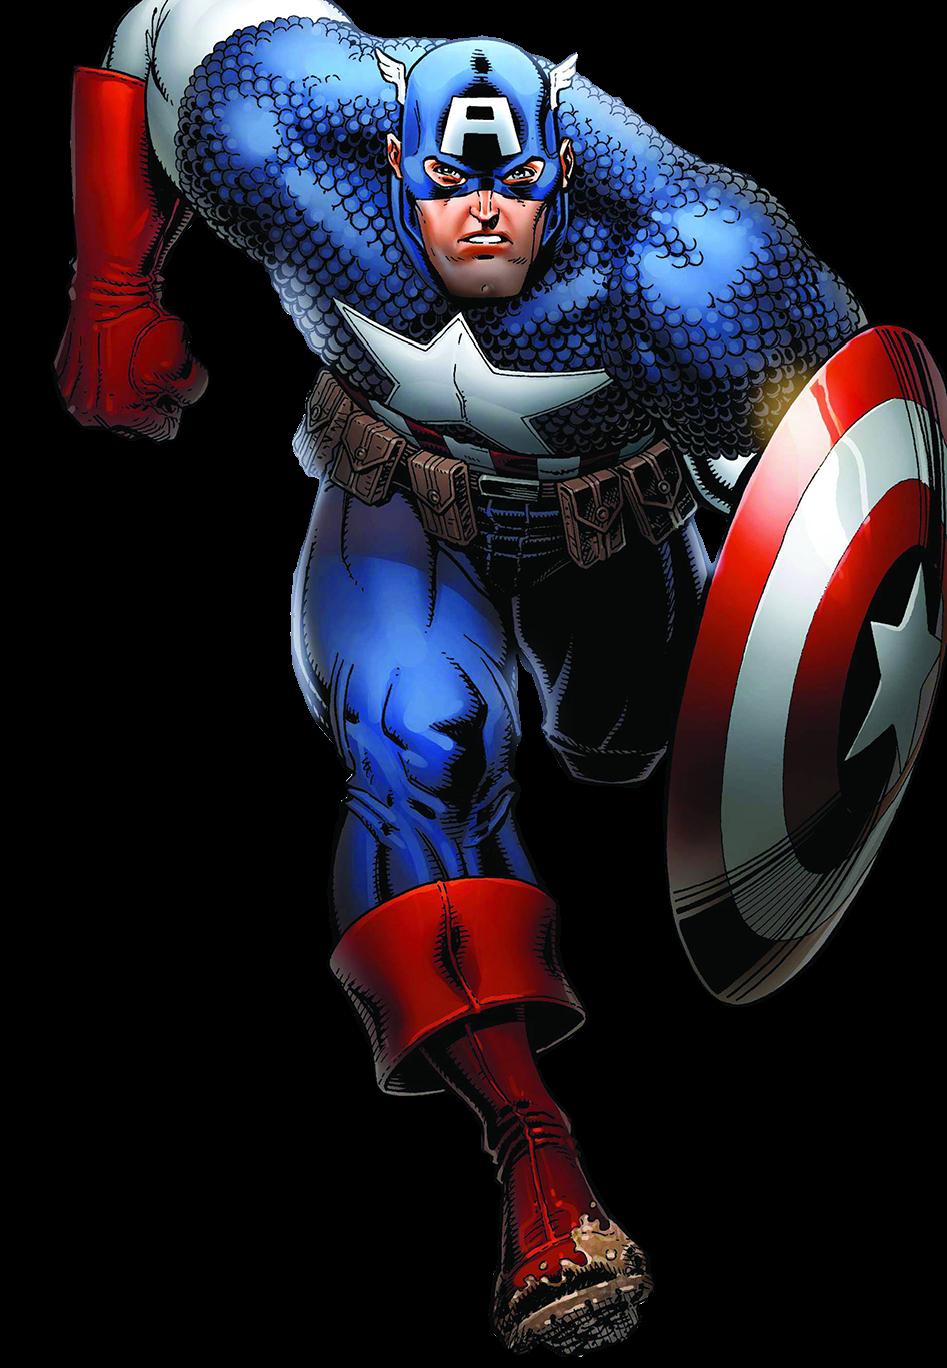 Captain-America by bobhertley on DeviantArt